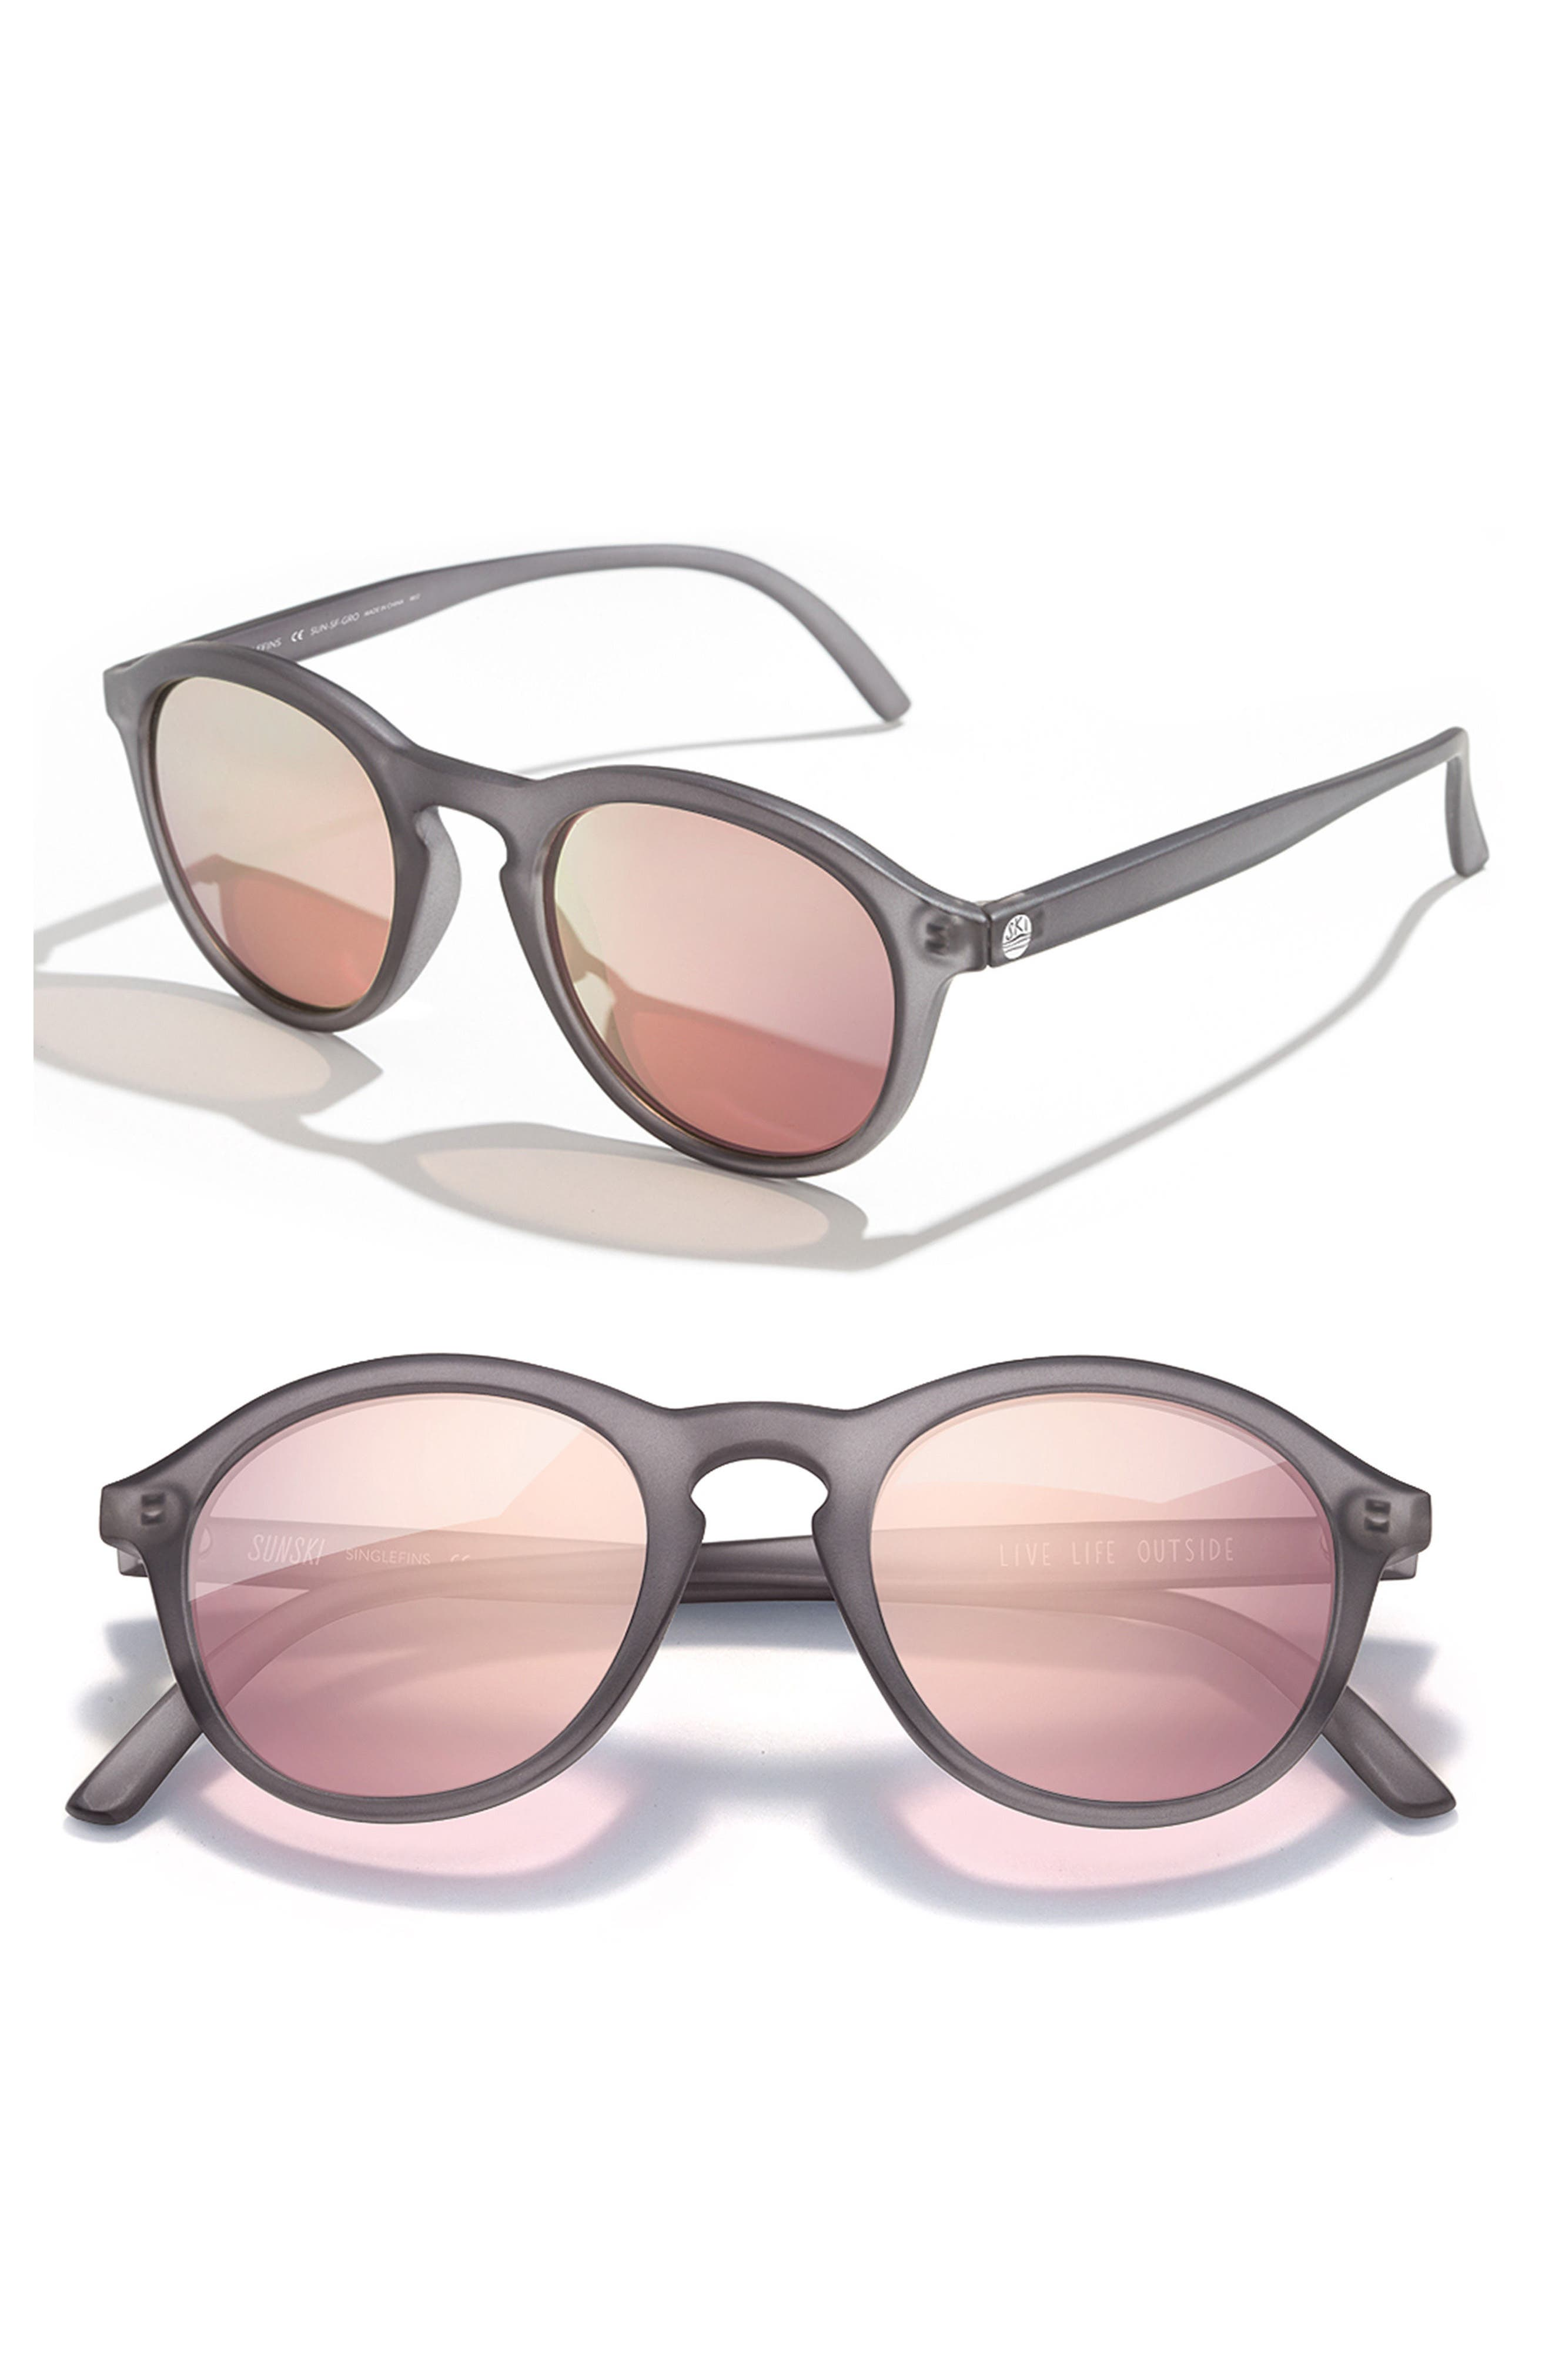 Sunski Singlefin 50Mm Polarized Sunglasses -